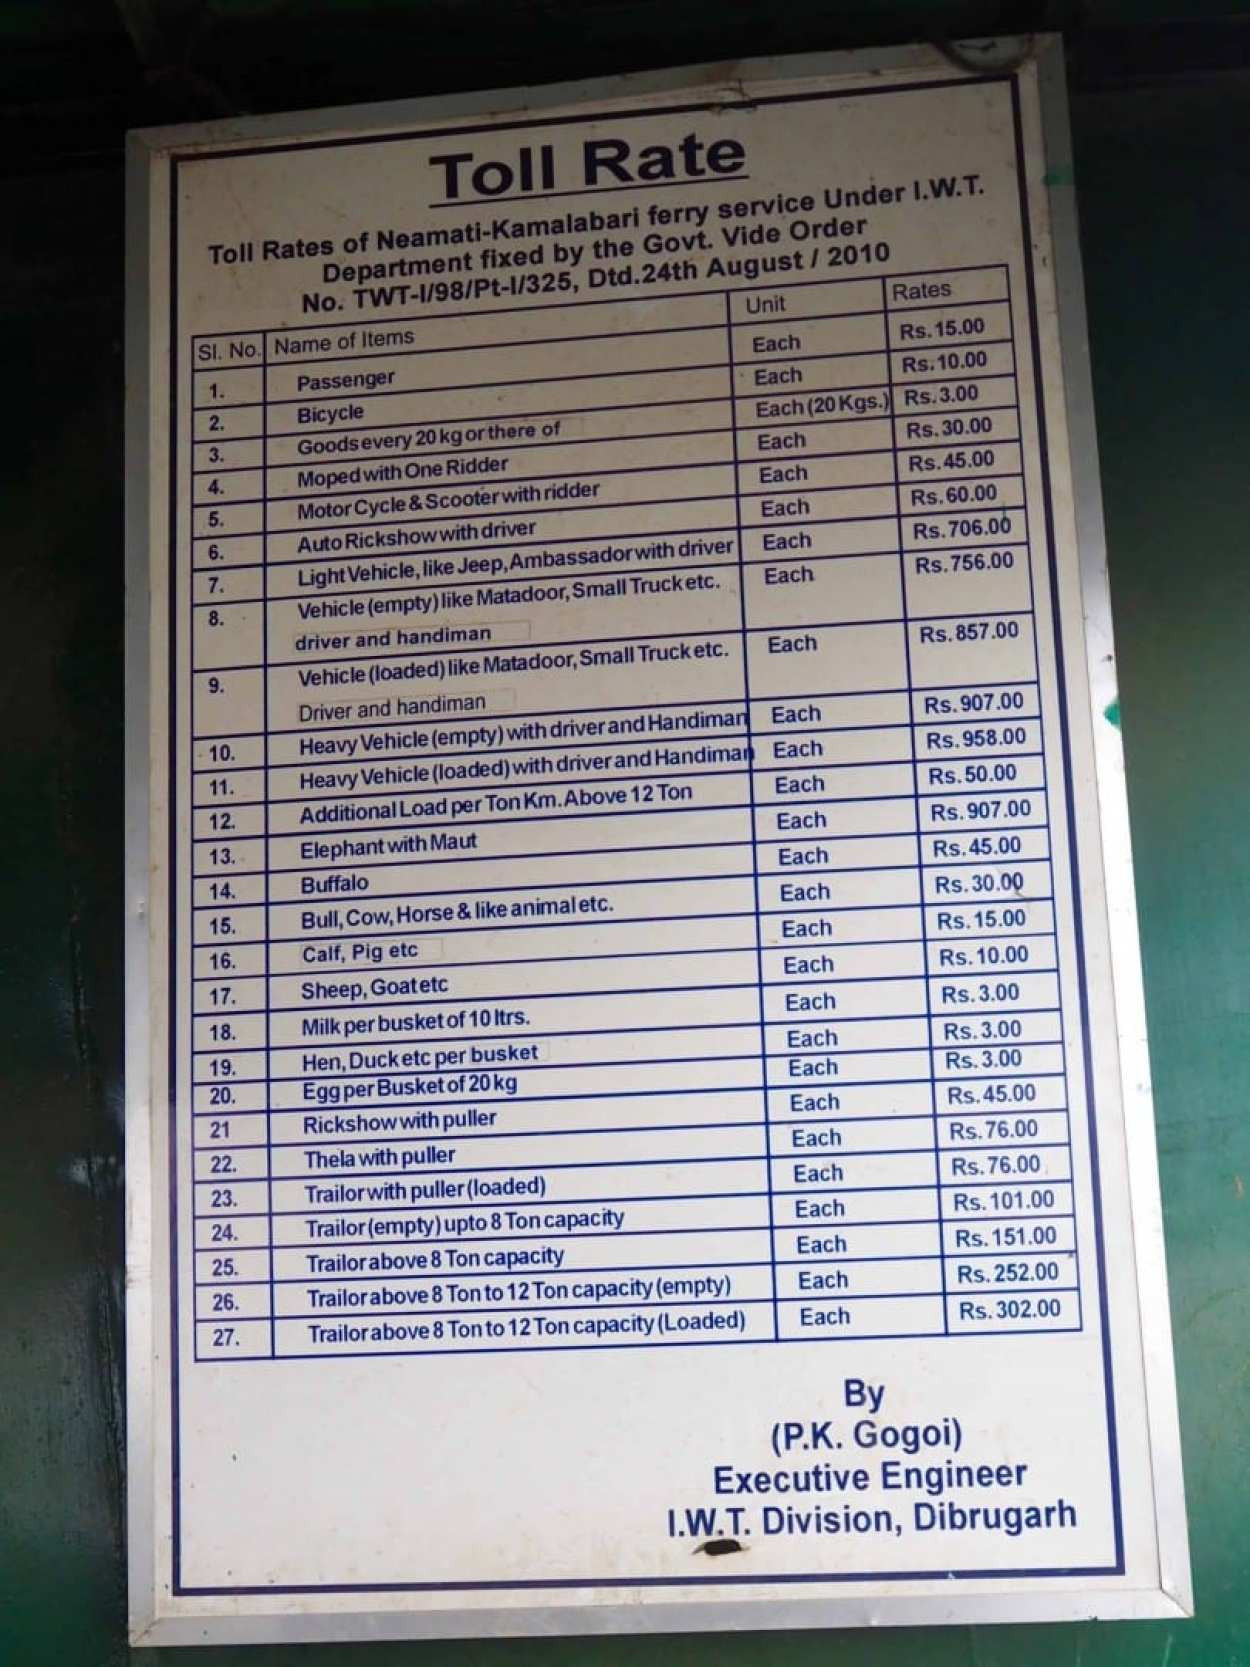 http://thirdeyetraveller.com/jorhat-majuli-island-2018-ferry-times-prices/